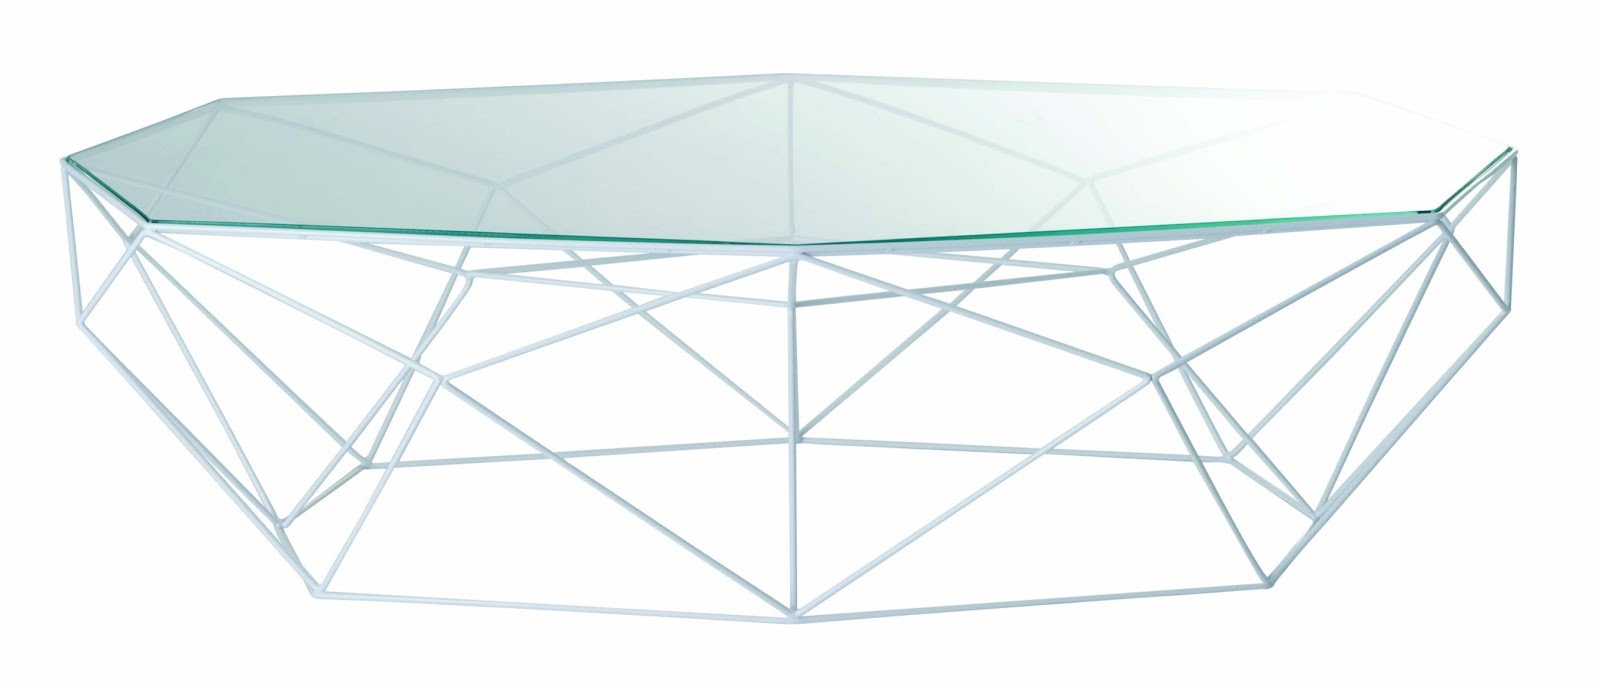 Table Basse Modulable En Hauteur Ikea ~ Houses Gardens People 2 1 13  3 1 13